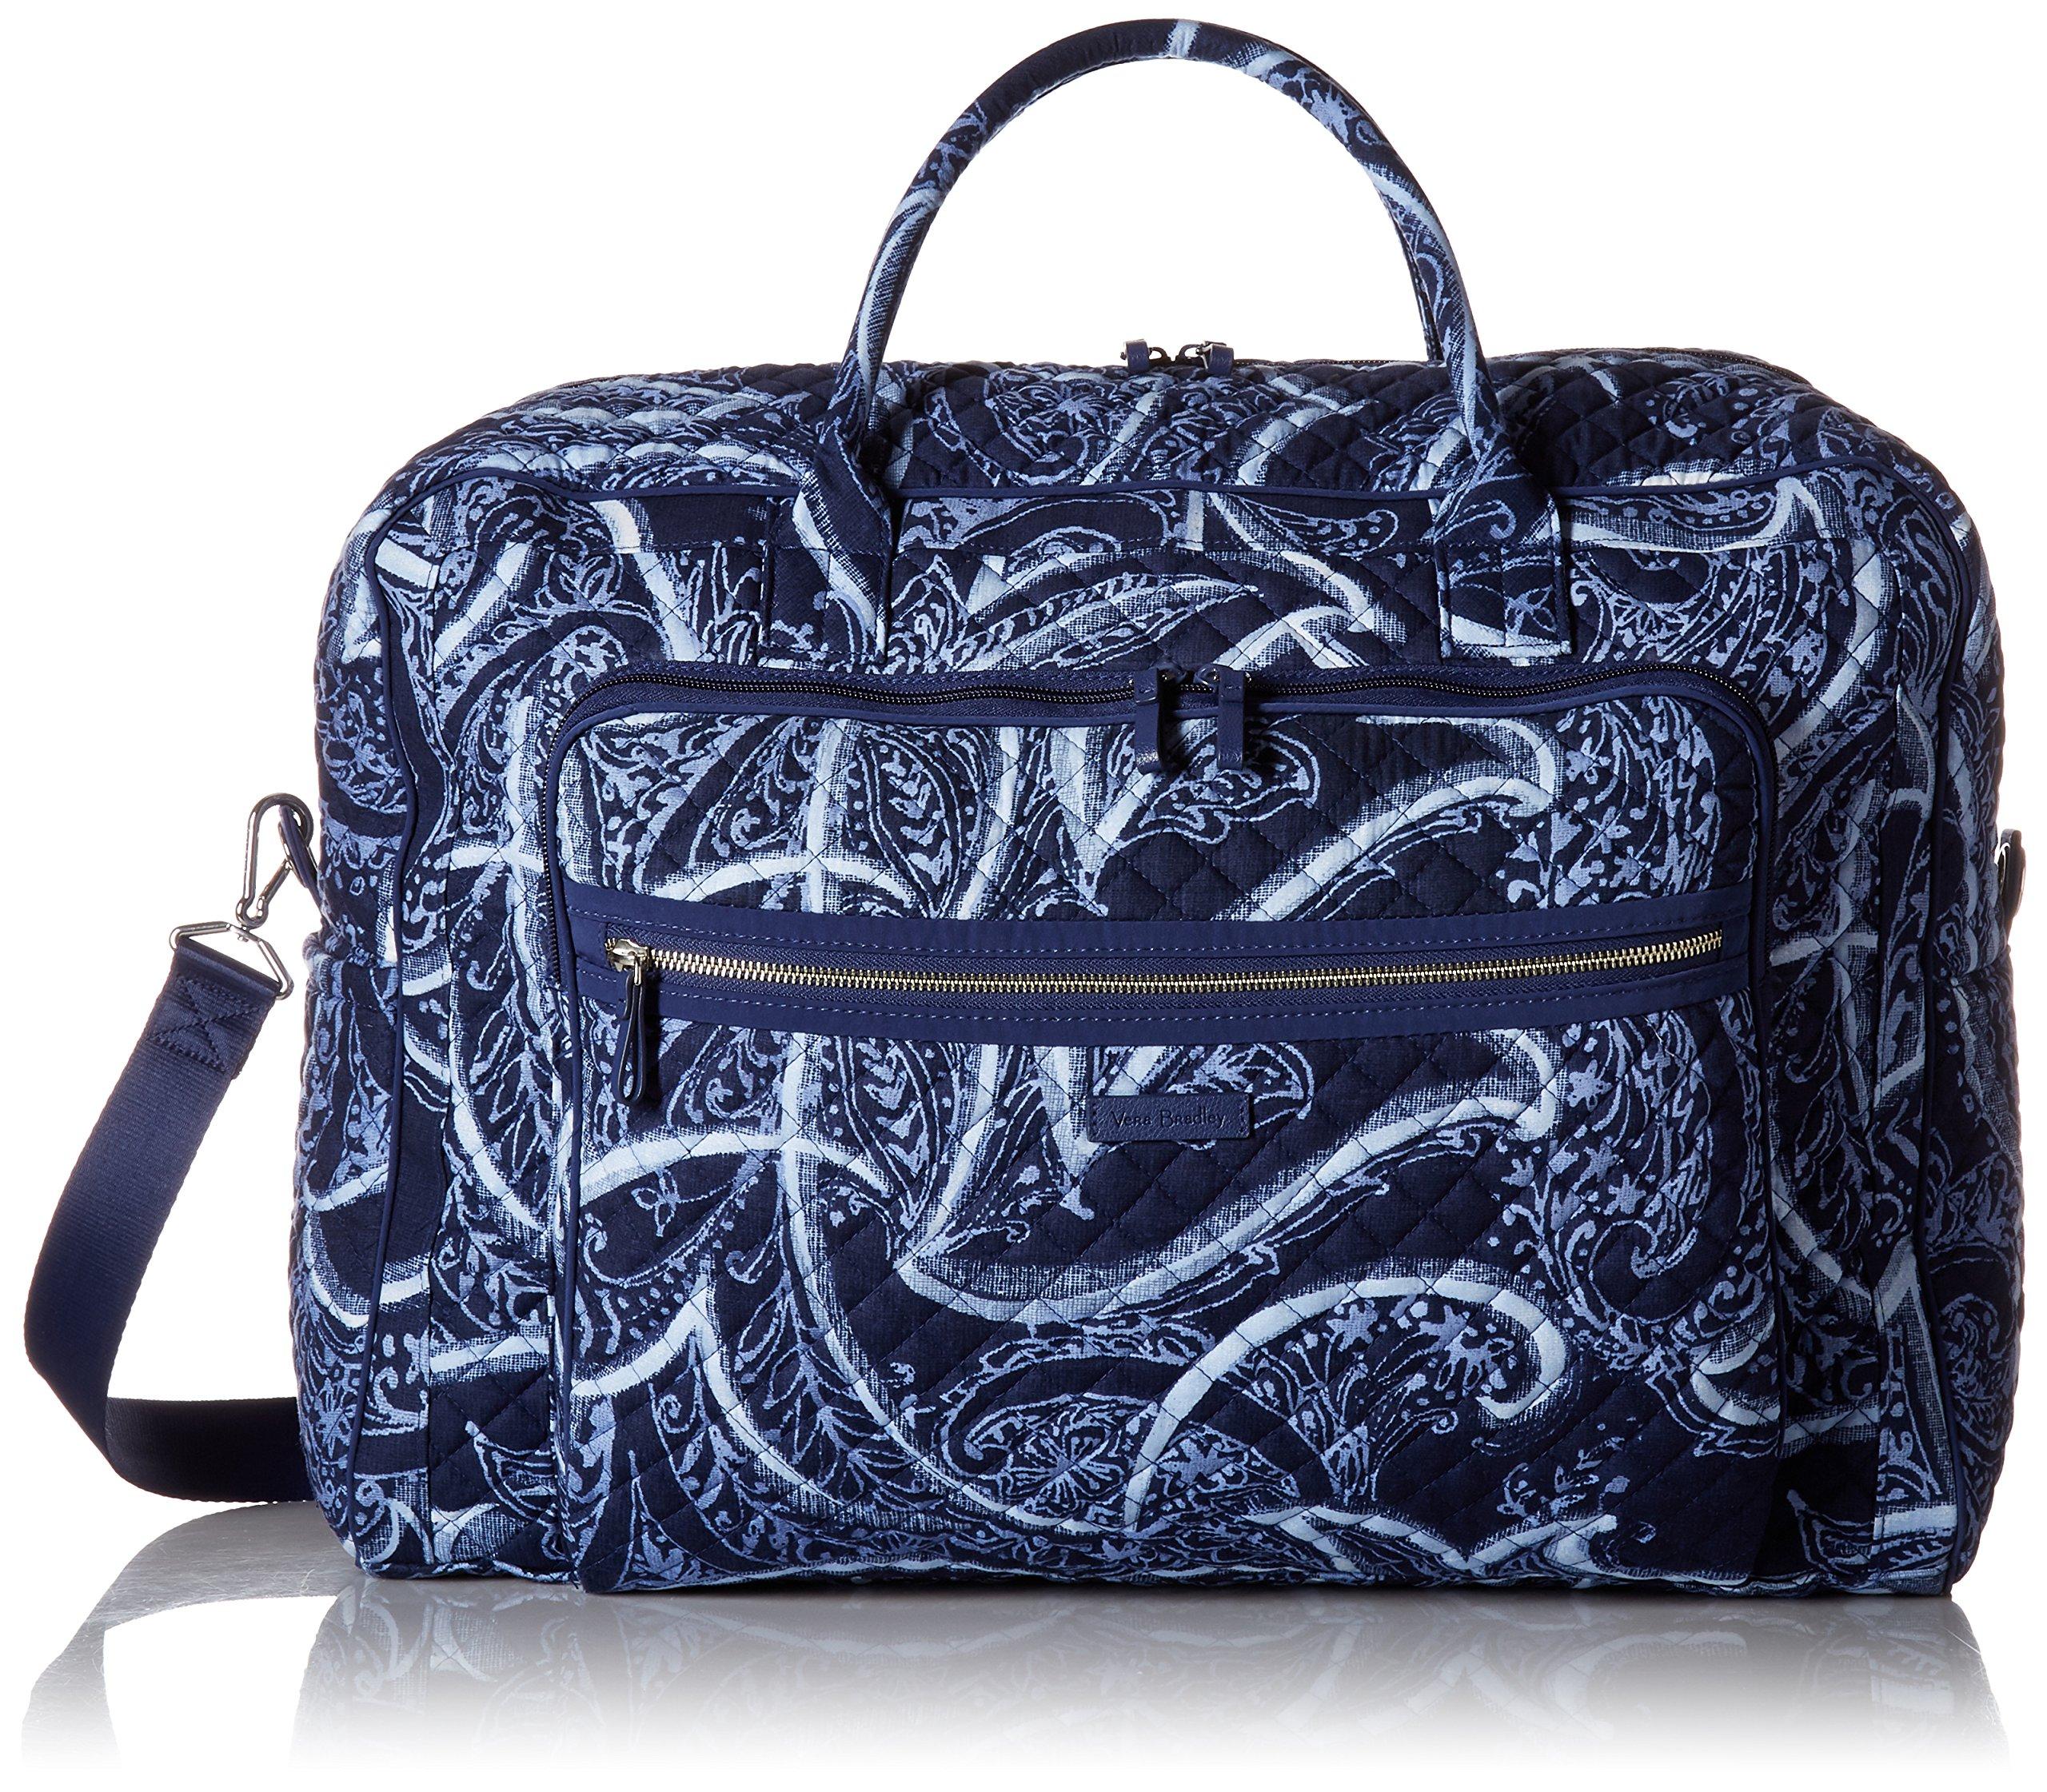 Vera Bradley Iconic Grand Weekender Travel Bag, Signature Cotton, Indio